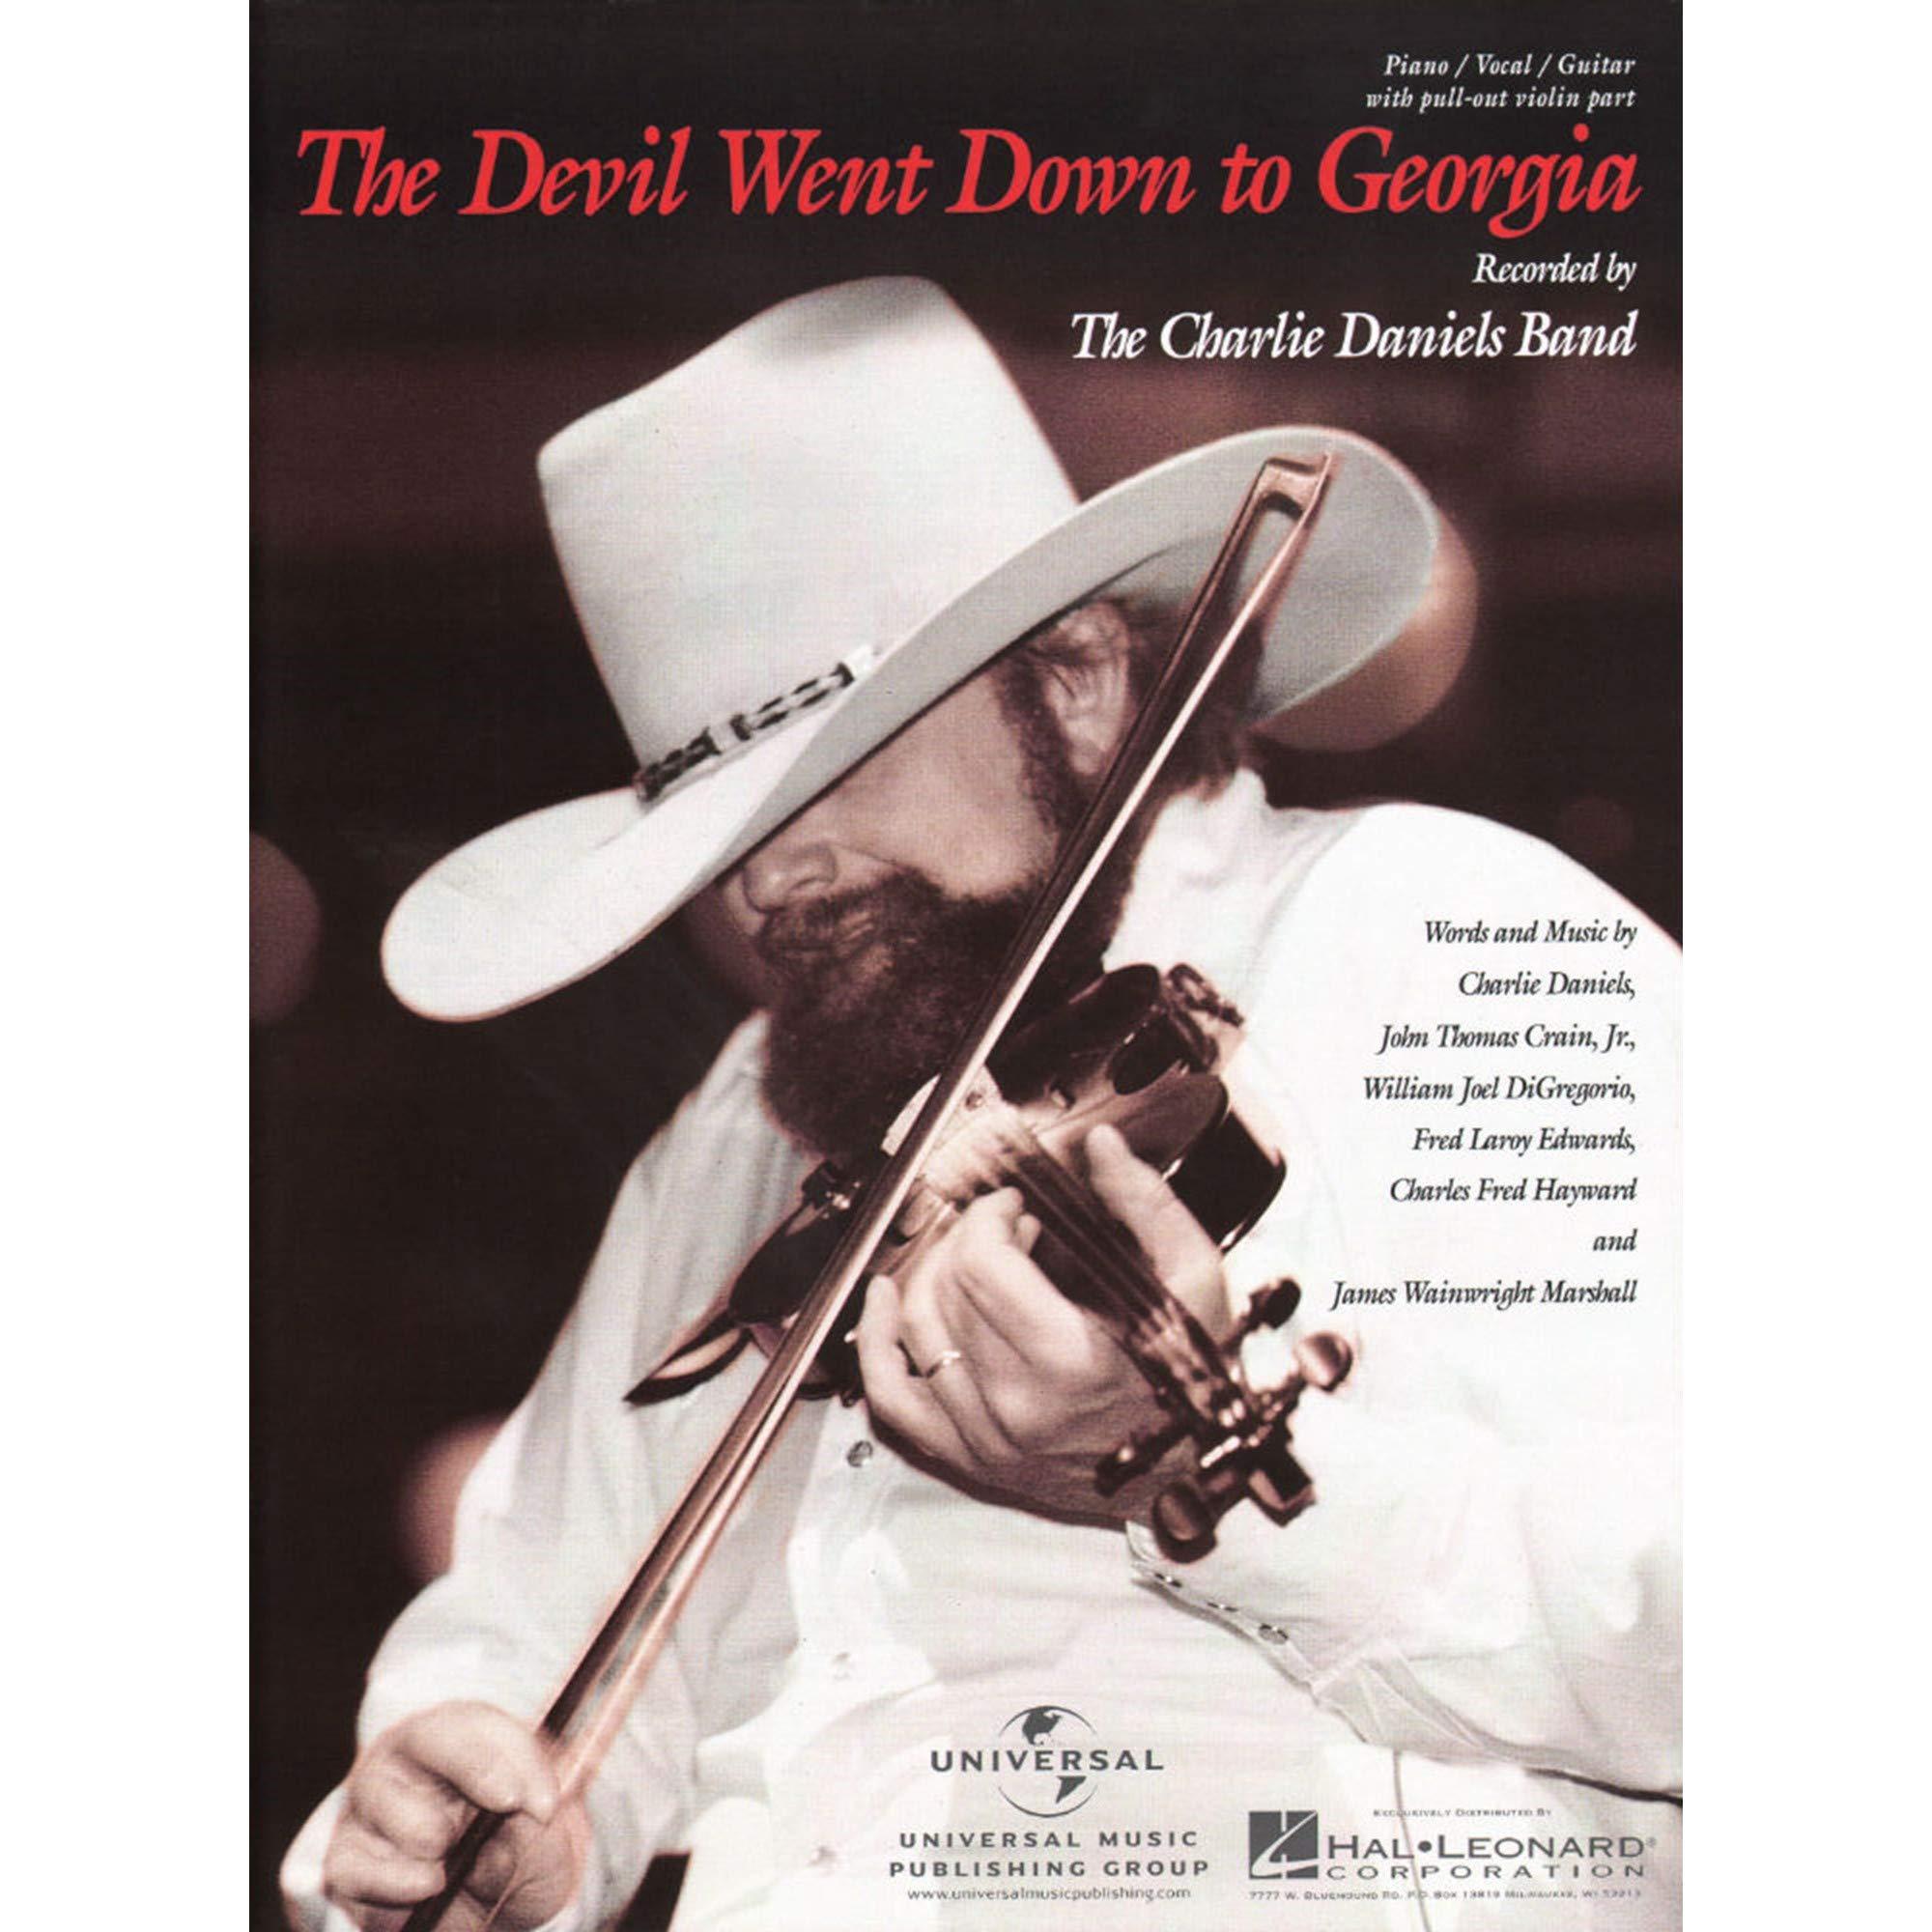 Charlie Daniels Band - Devil Went Down to Georgia